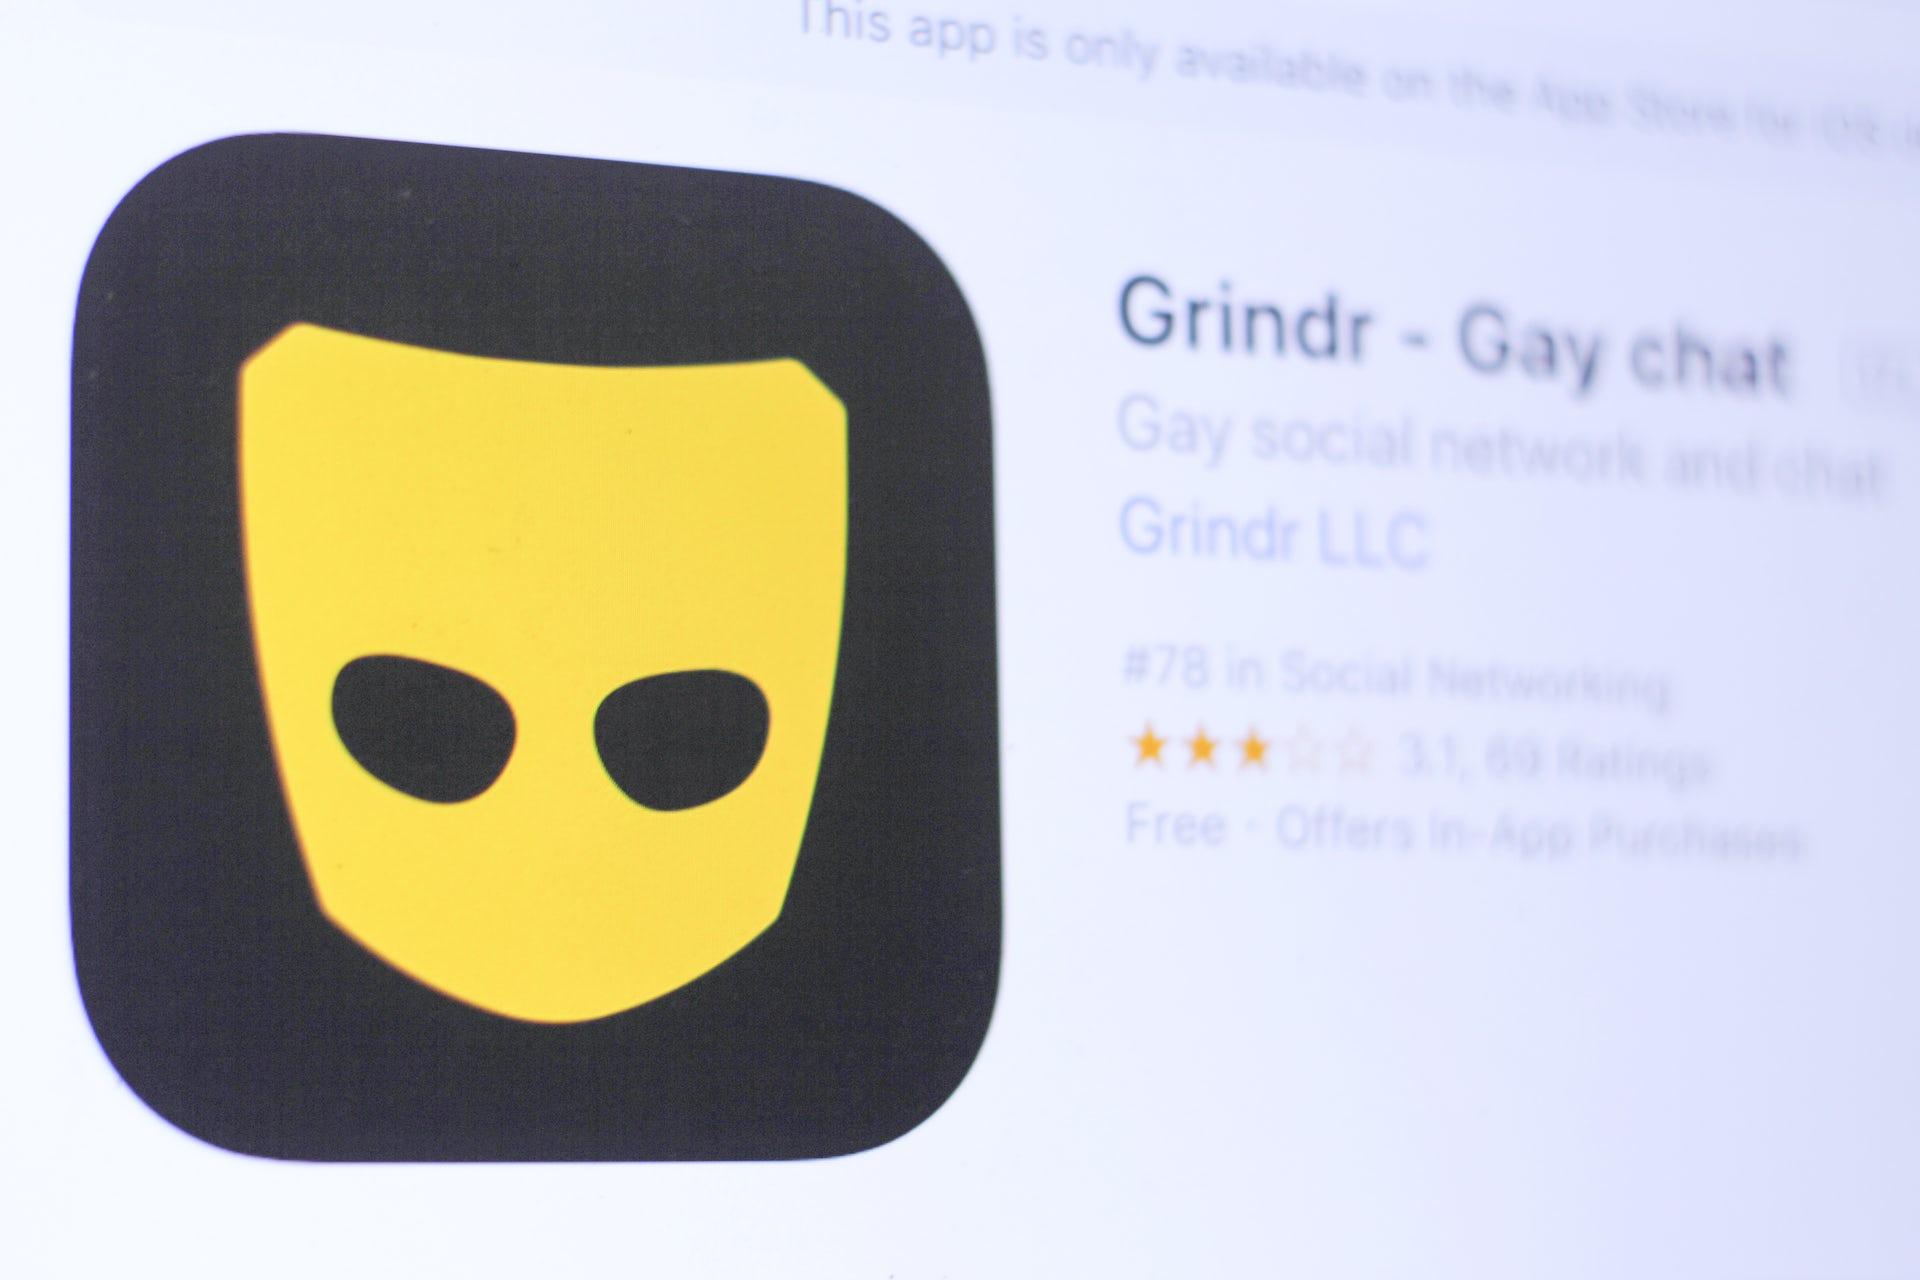 Man hole gay chat